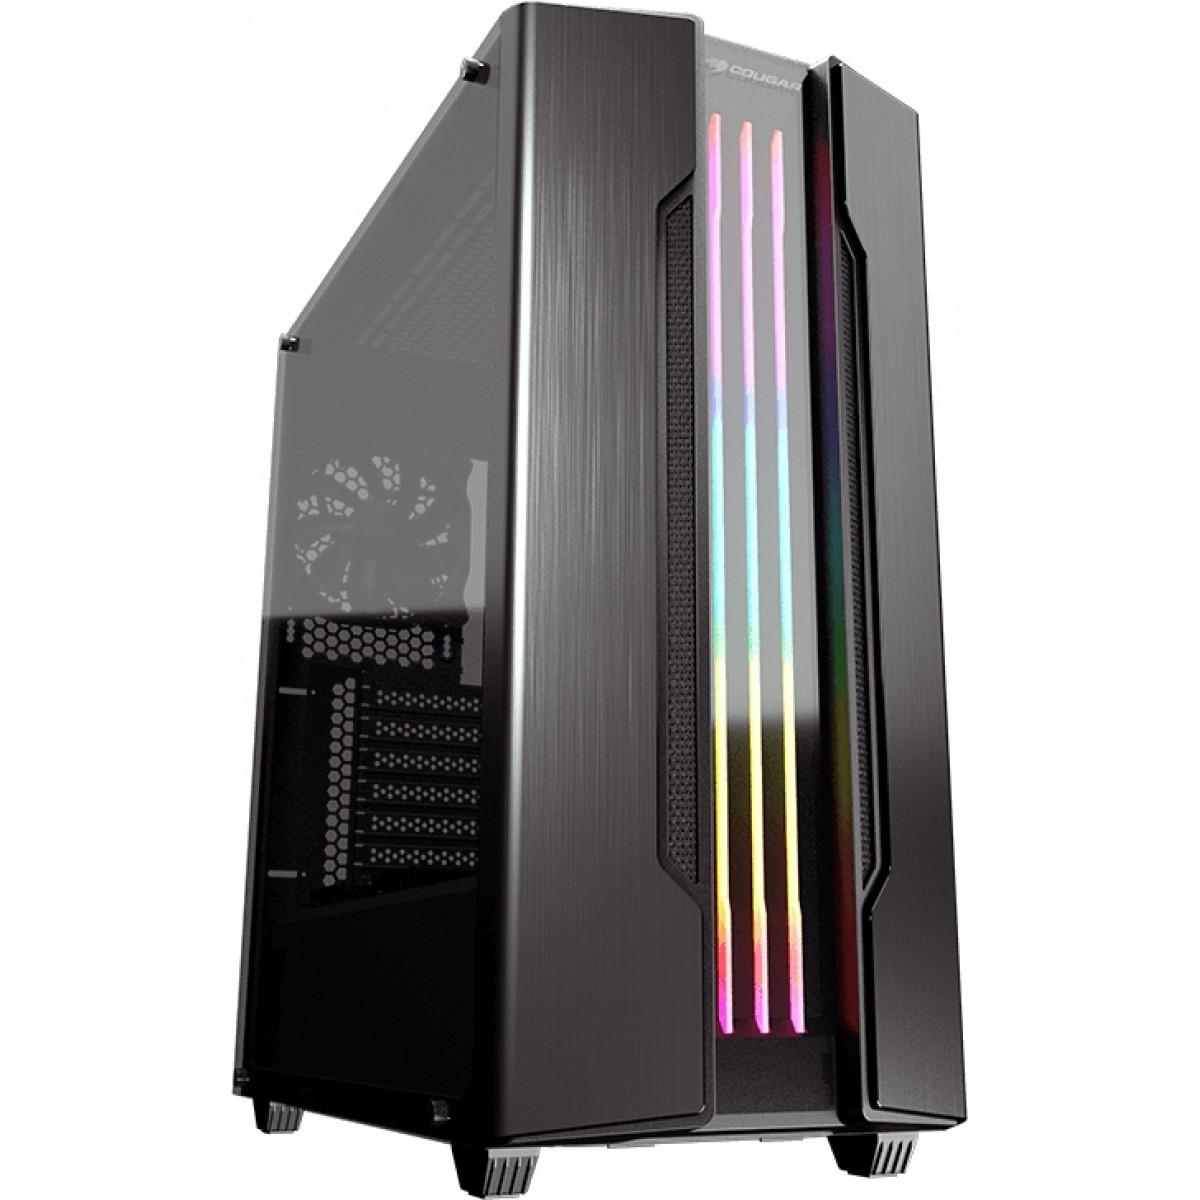 Gabinete Gamer Cougar Gemini S Iron Grey, Mid Tower, Vidro Temperado, Black, Sem Fonte, Com 1 Fan, 385BMB0-0001